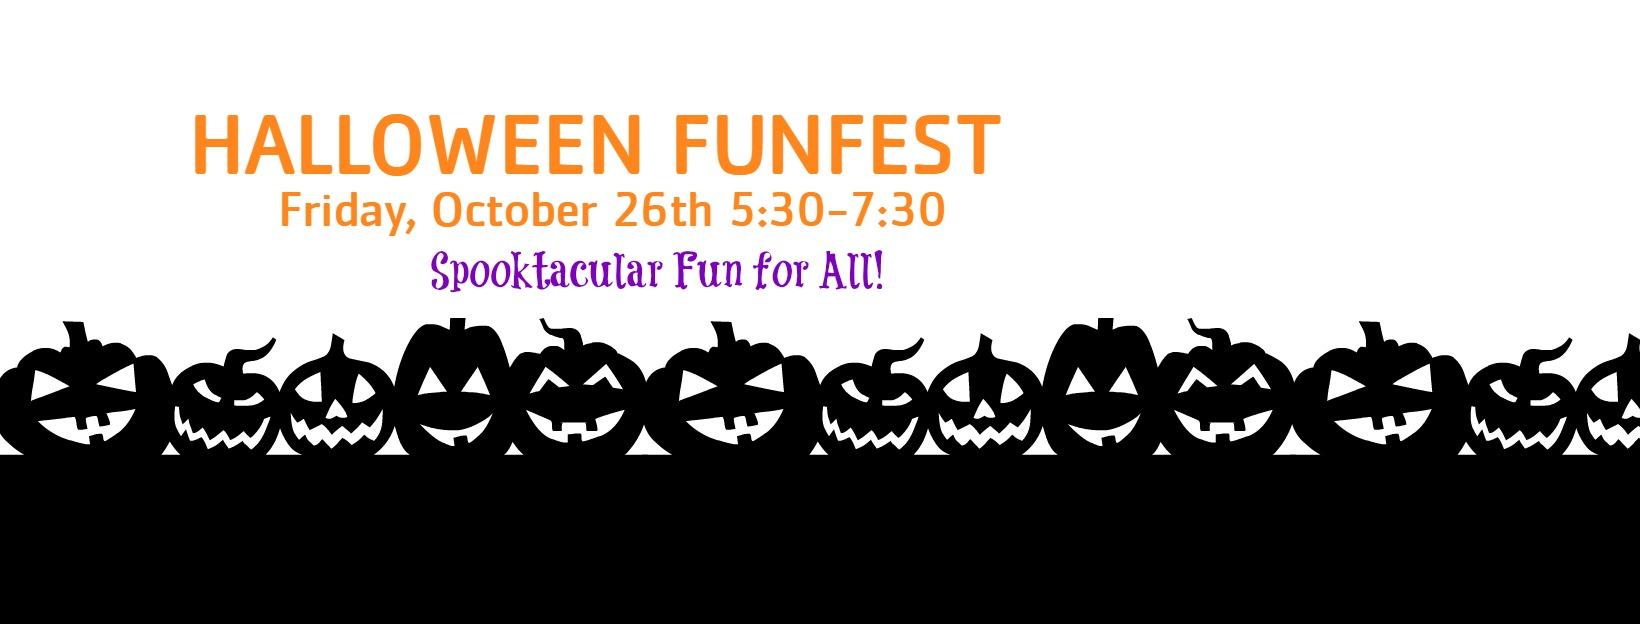 Free Halloween FunFest Pooler